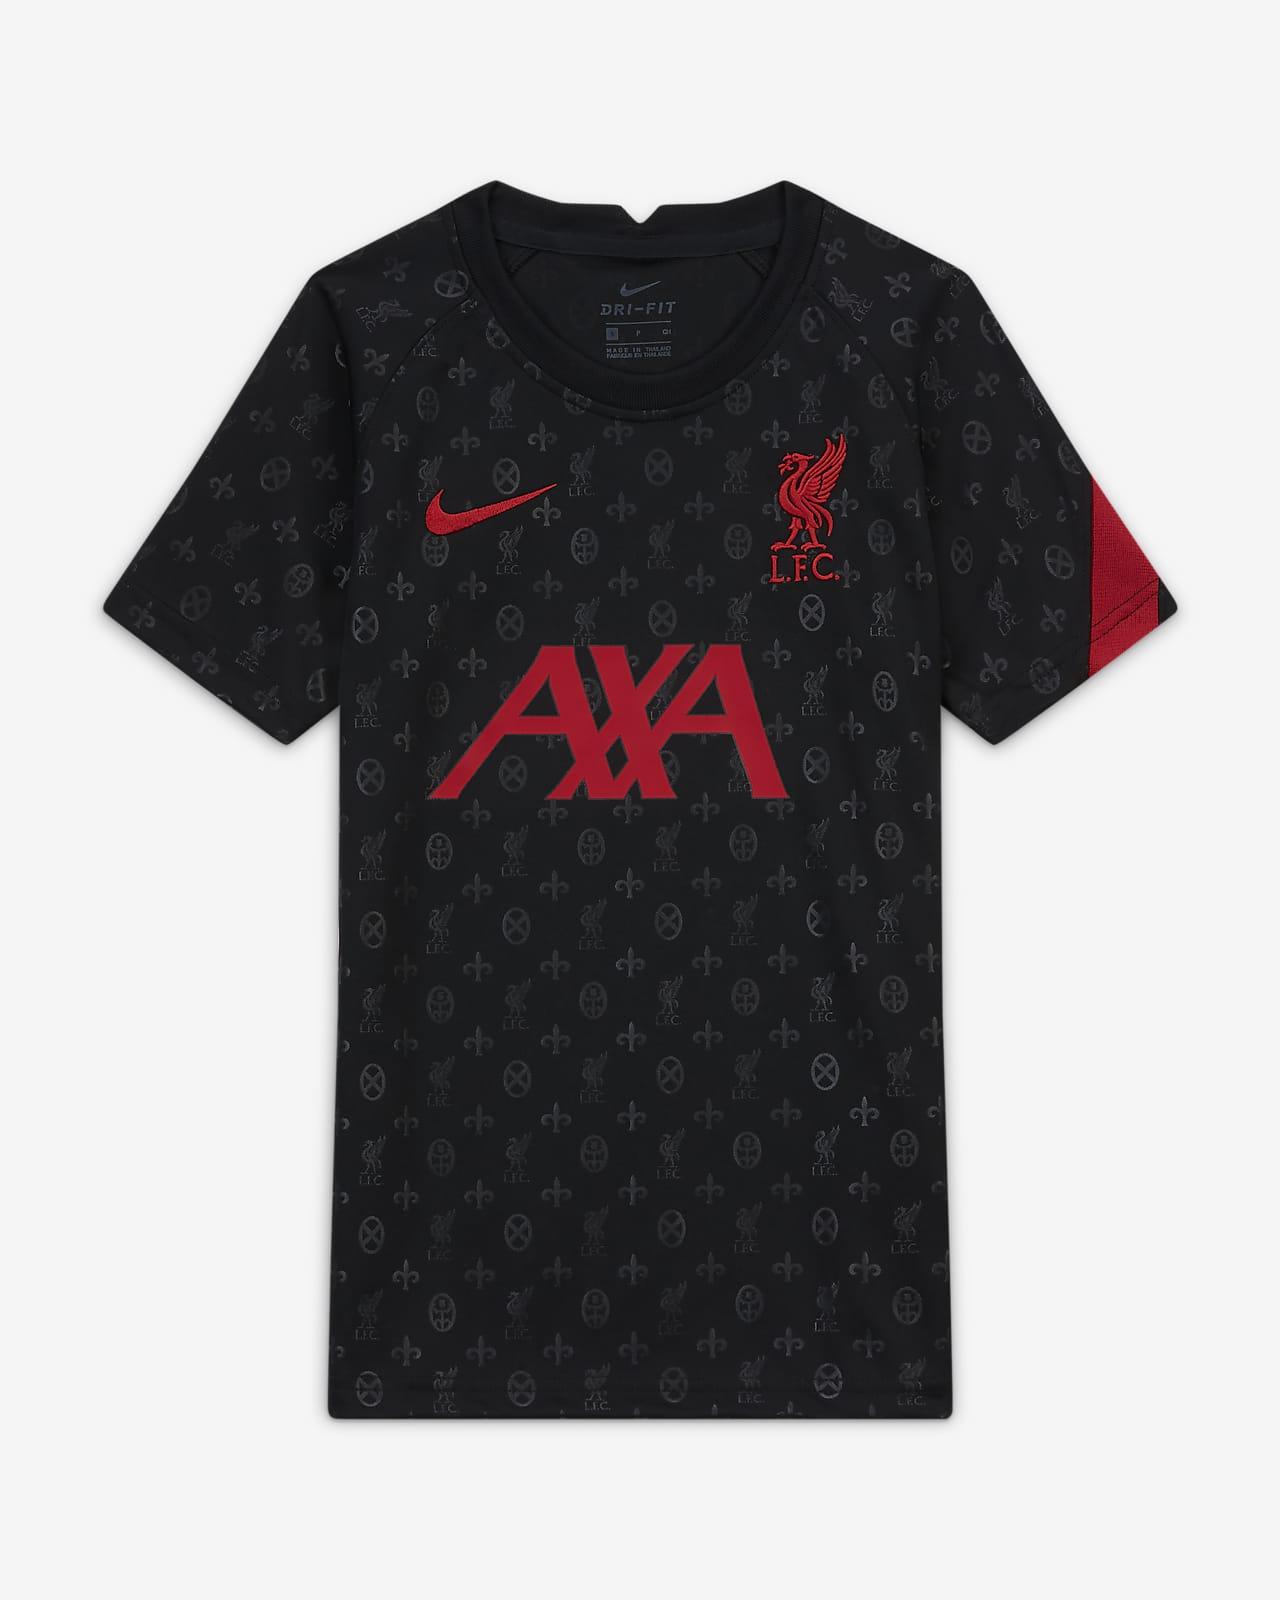 Liverpool F.C. Older Kids' Pre-Match Short-Sleeve Football Top